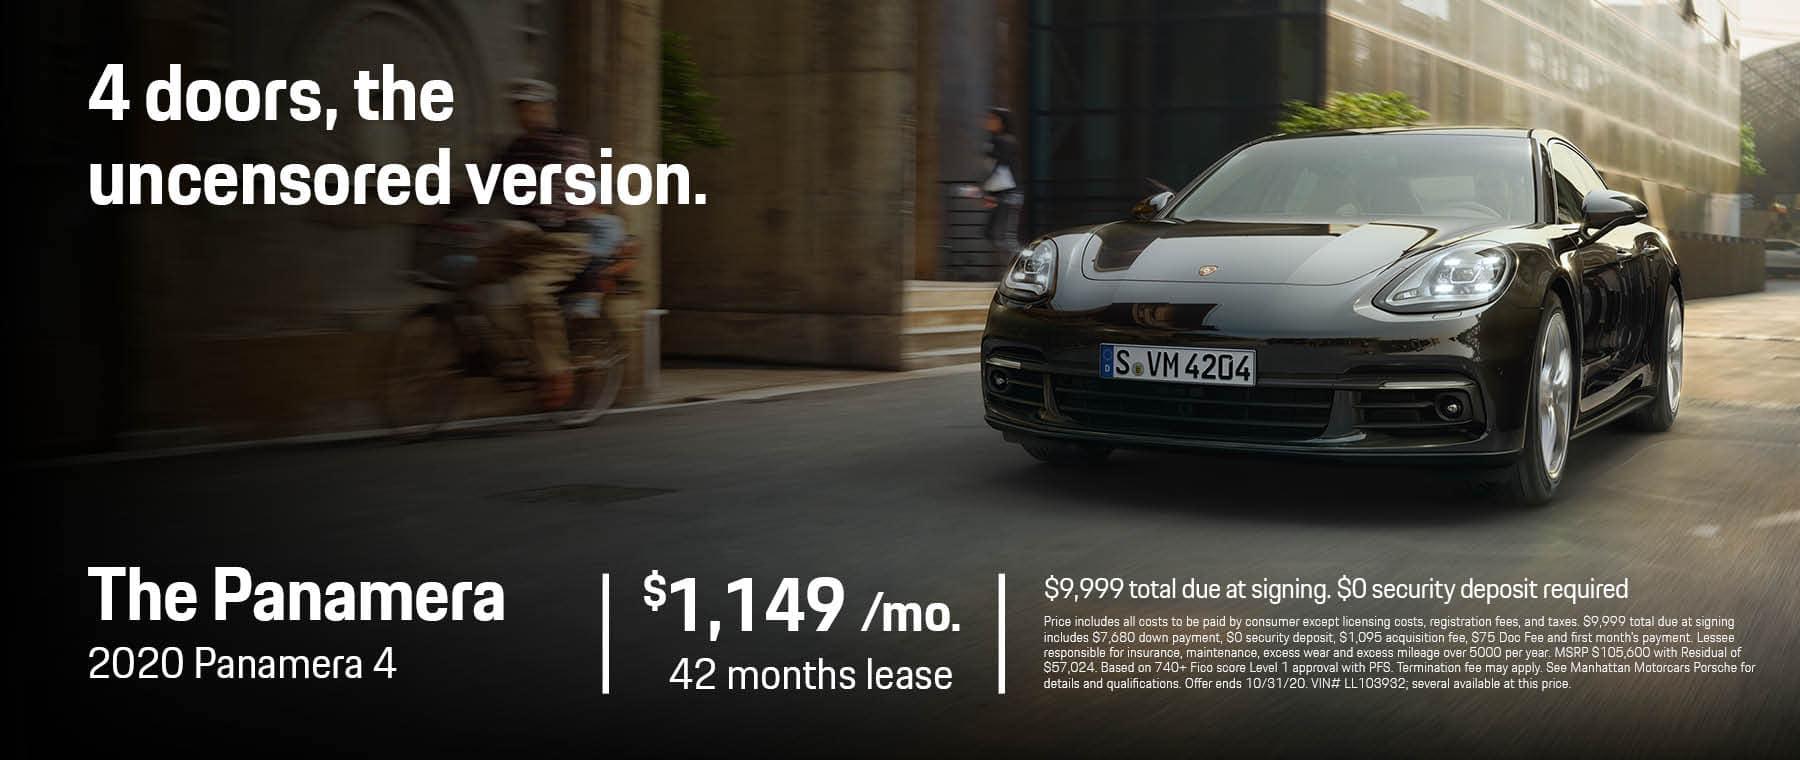 Princeton Porsche October 2020 1800 x 760 Panamera 4